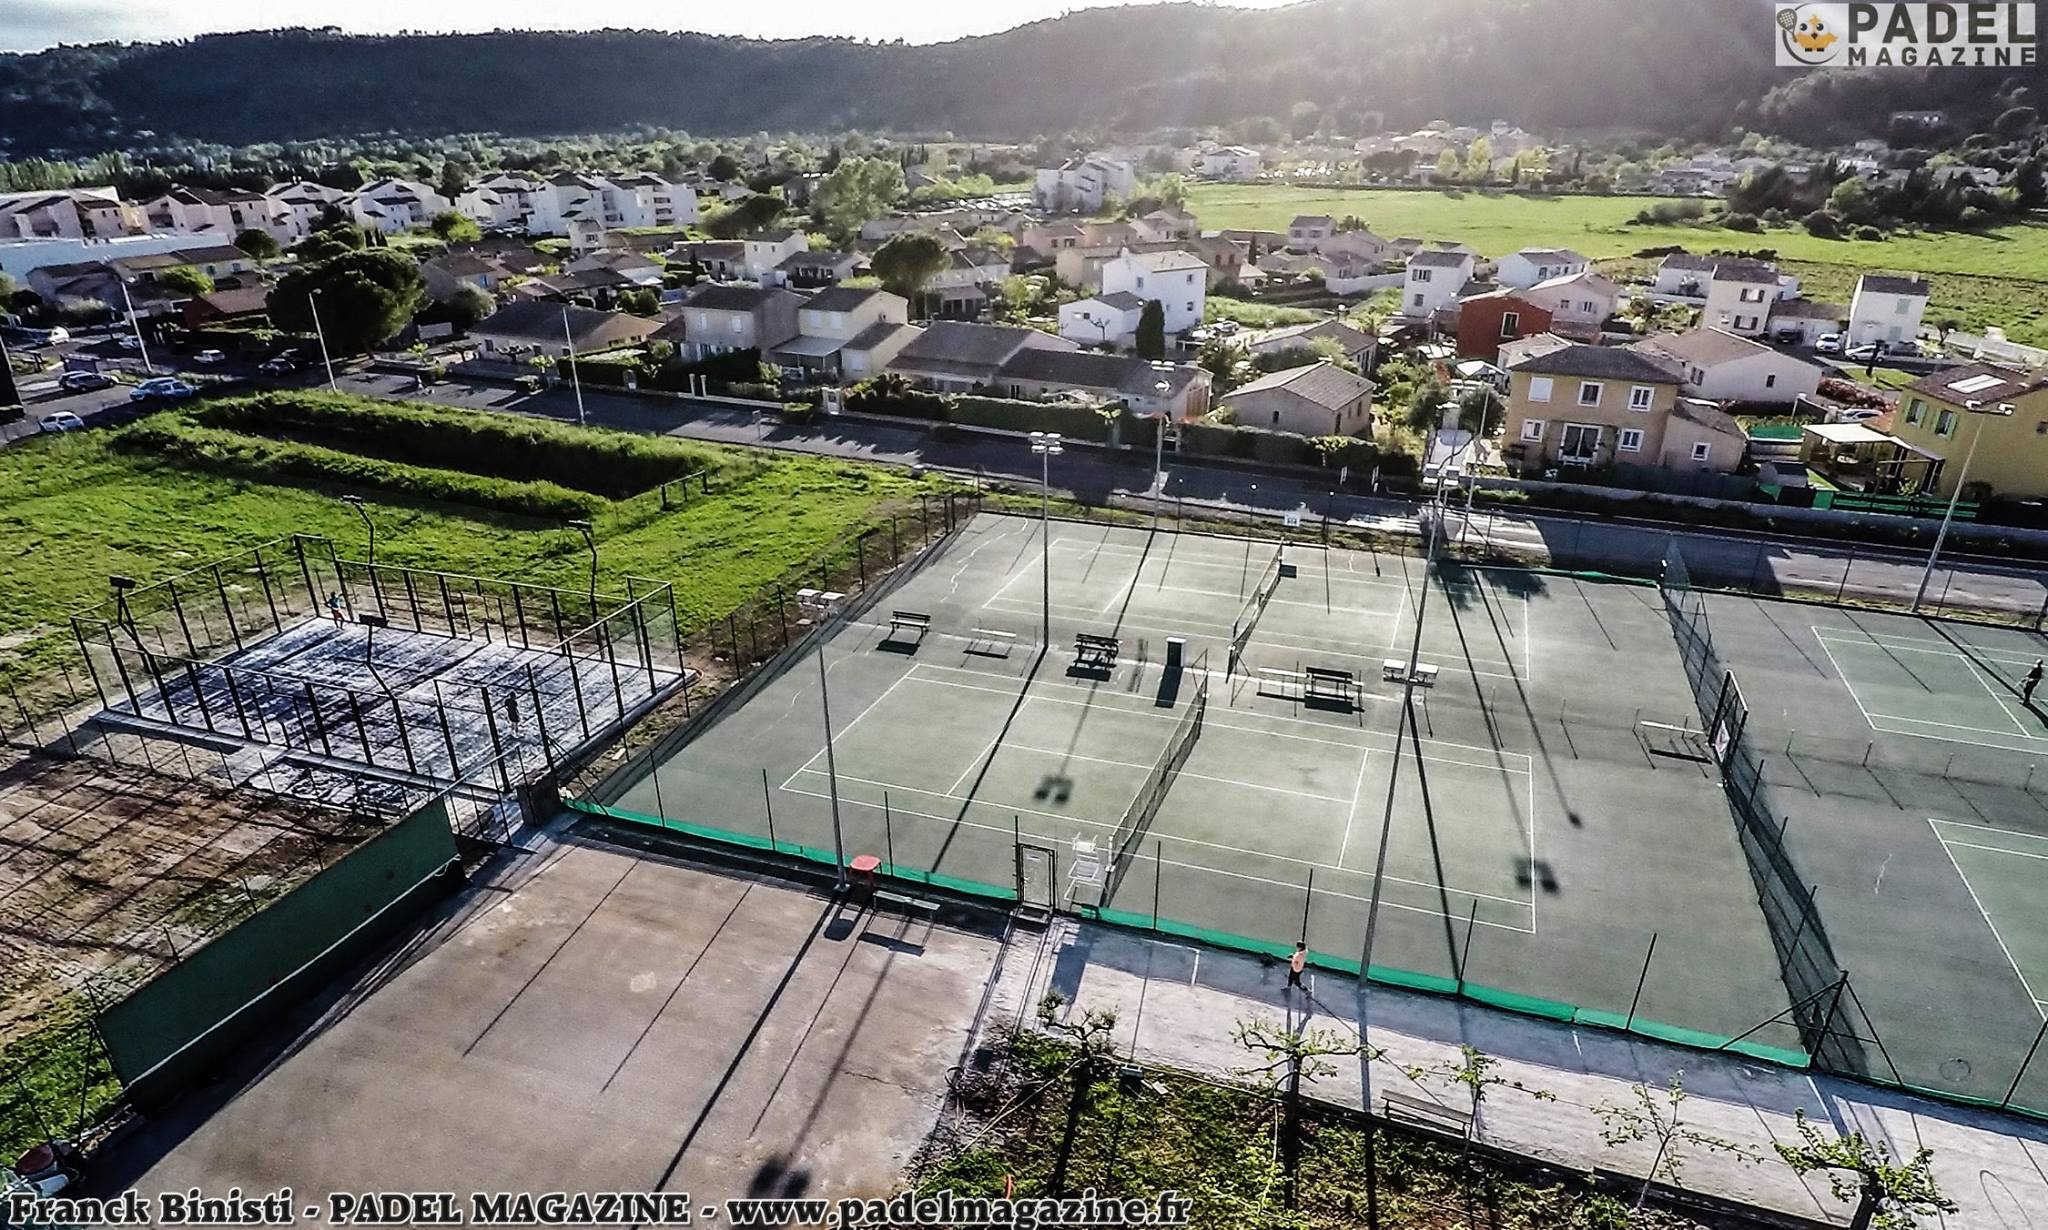 Tennis Padel Luçois uses ADVANTAGE PADEL